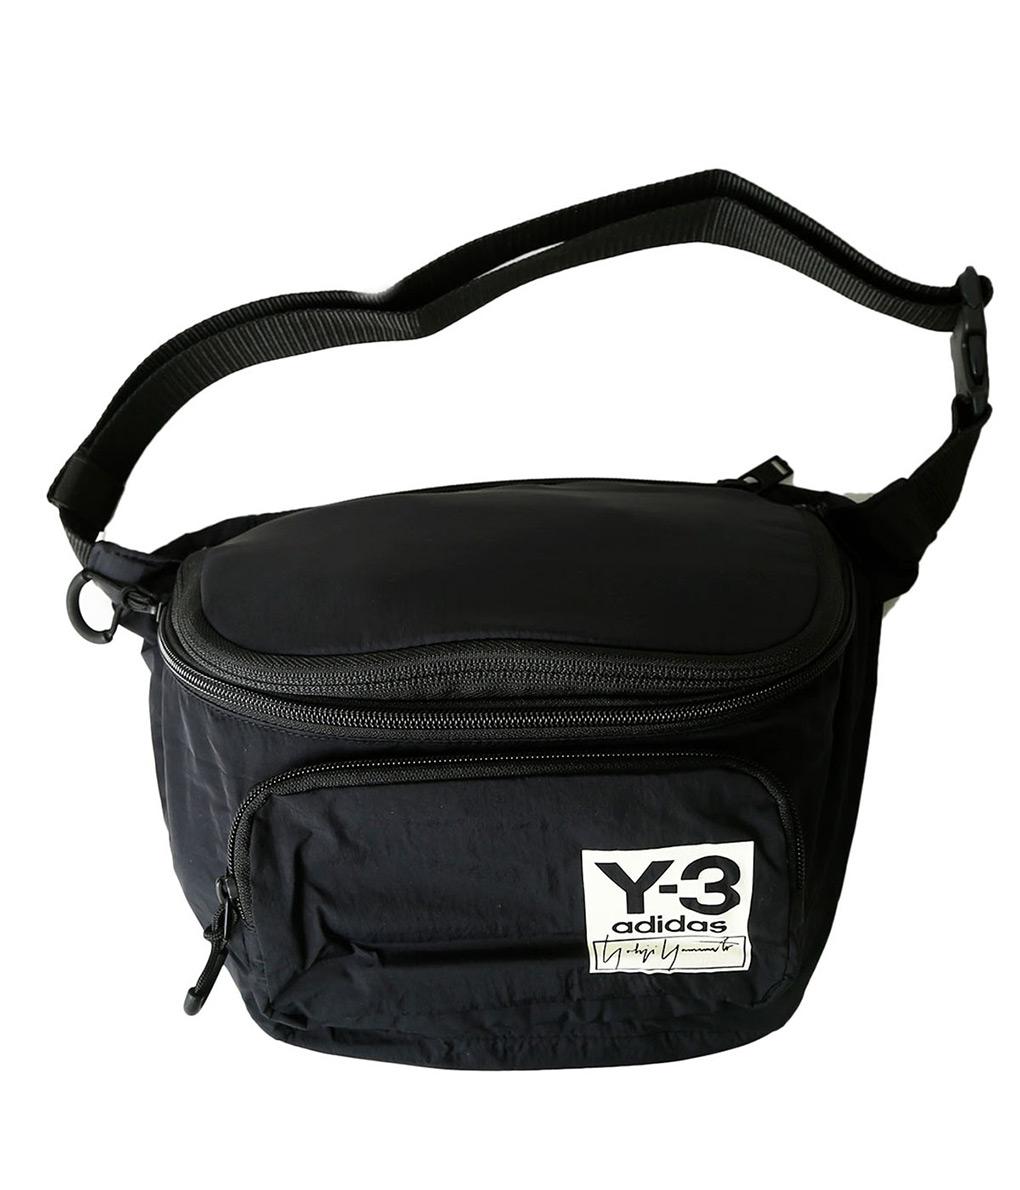 Y-3 / ワイスリー : Y-3 PACKABLE BP : パッカブル ヨウジヤマモト ワイスリー 19AW 19秋冬 メンズ : FH9255-bjb 【BJB】